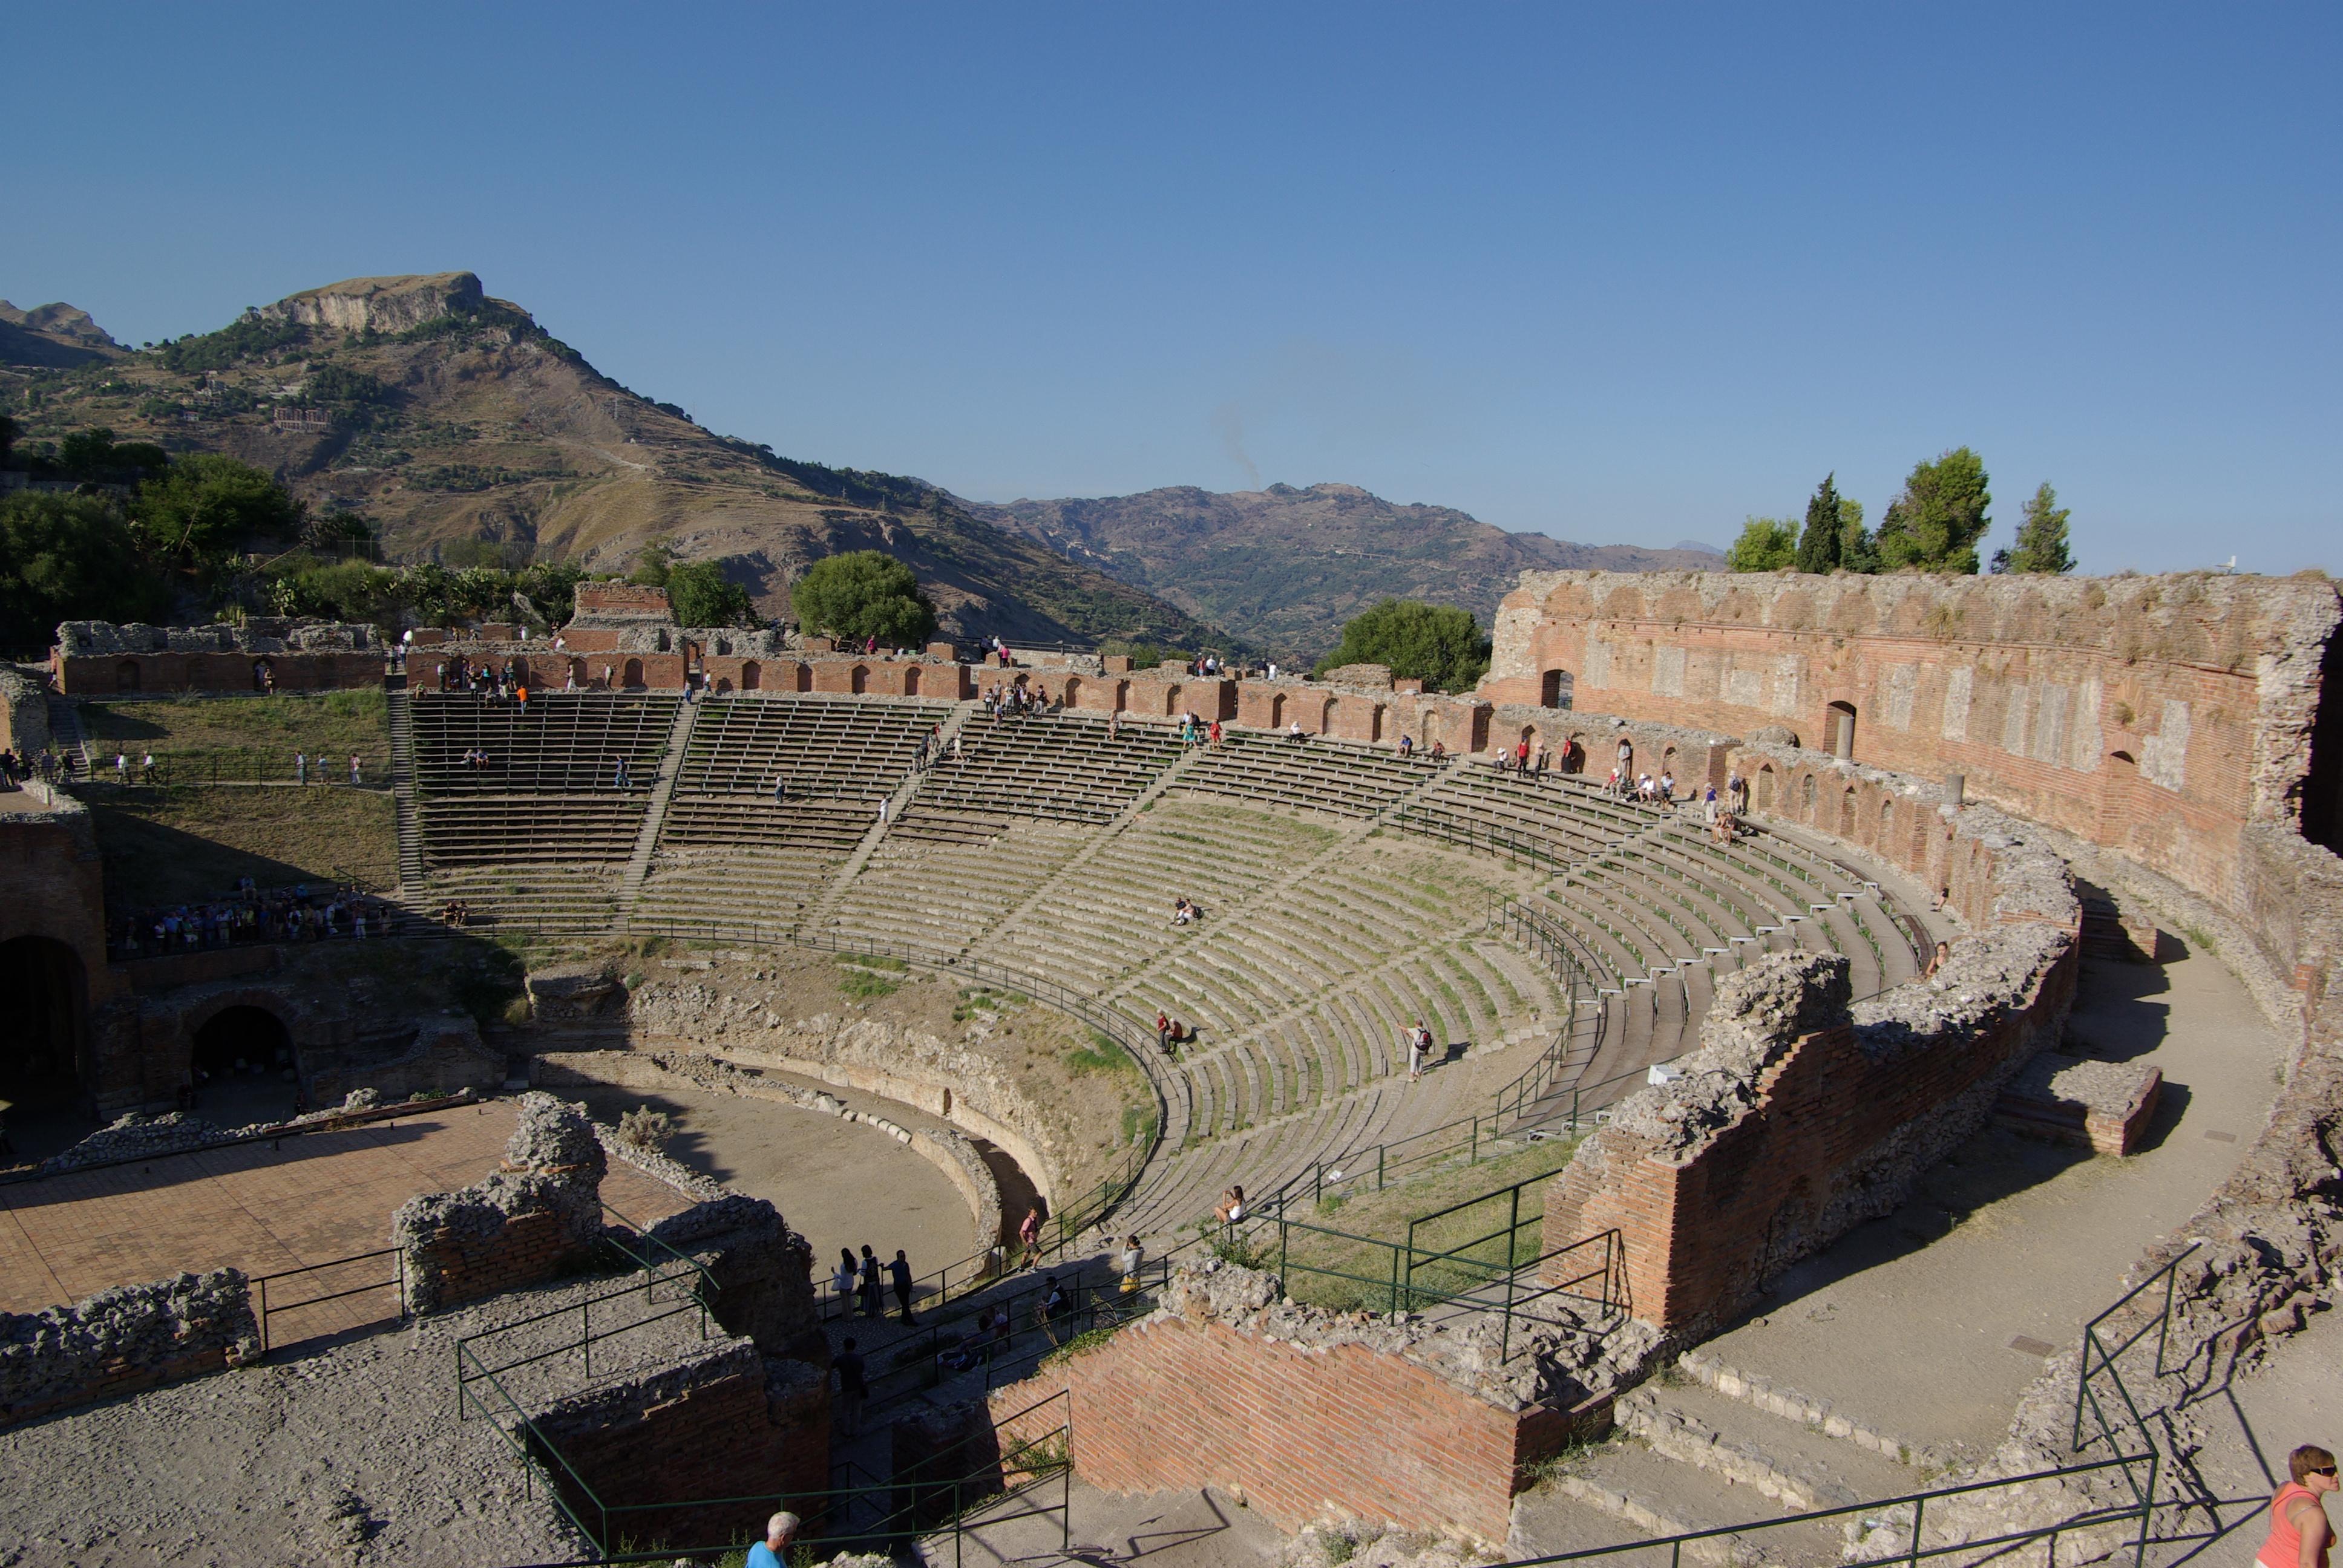 Casa Coppola Roma Rm taormina – travel guide at wikivoyage